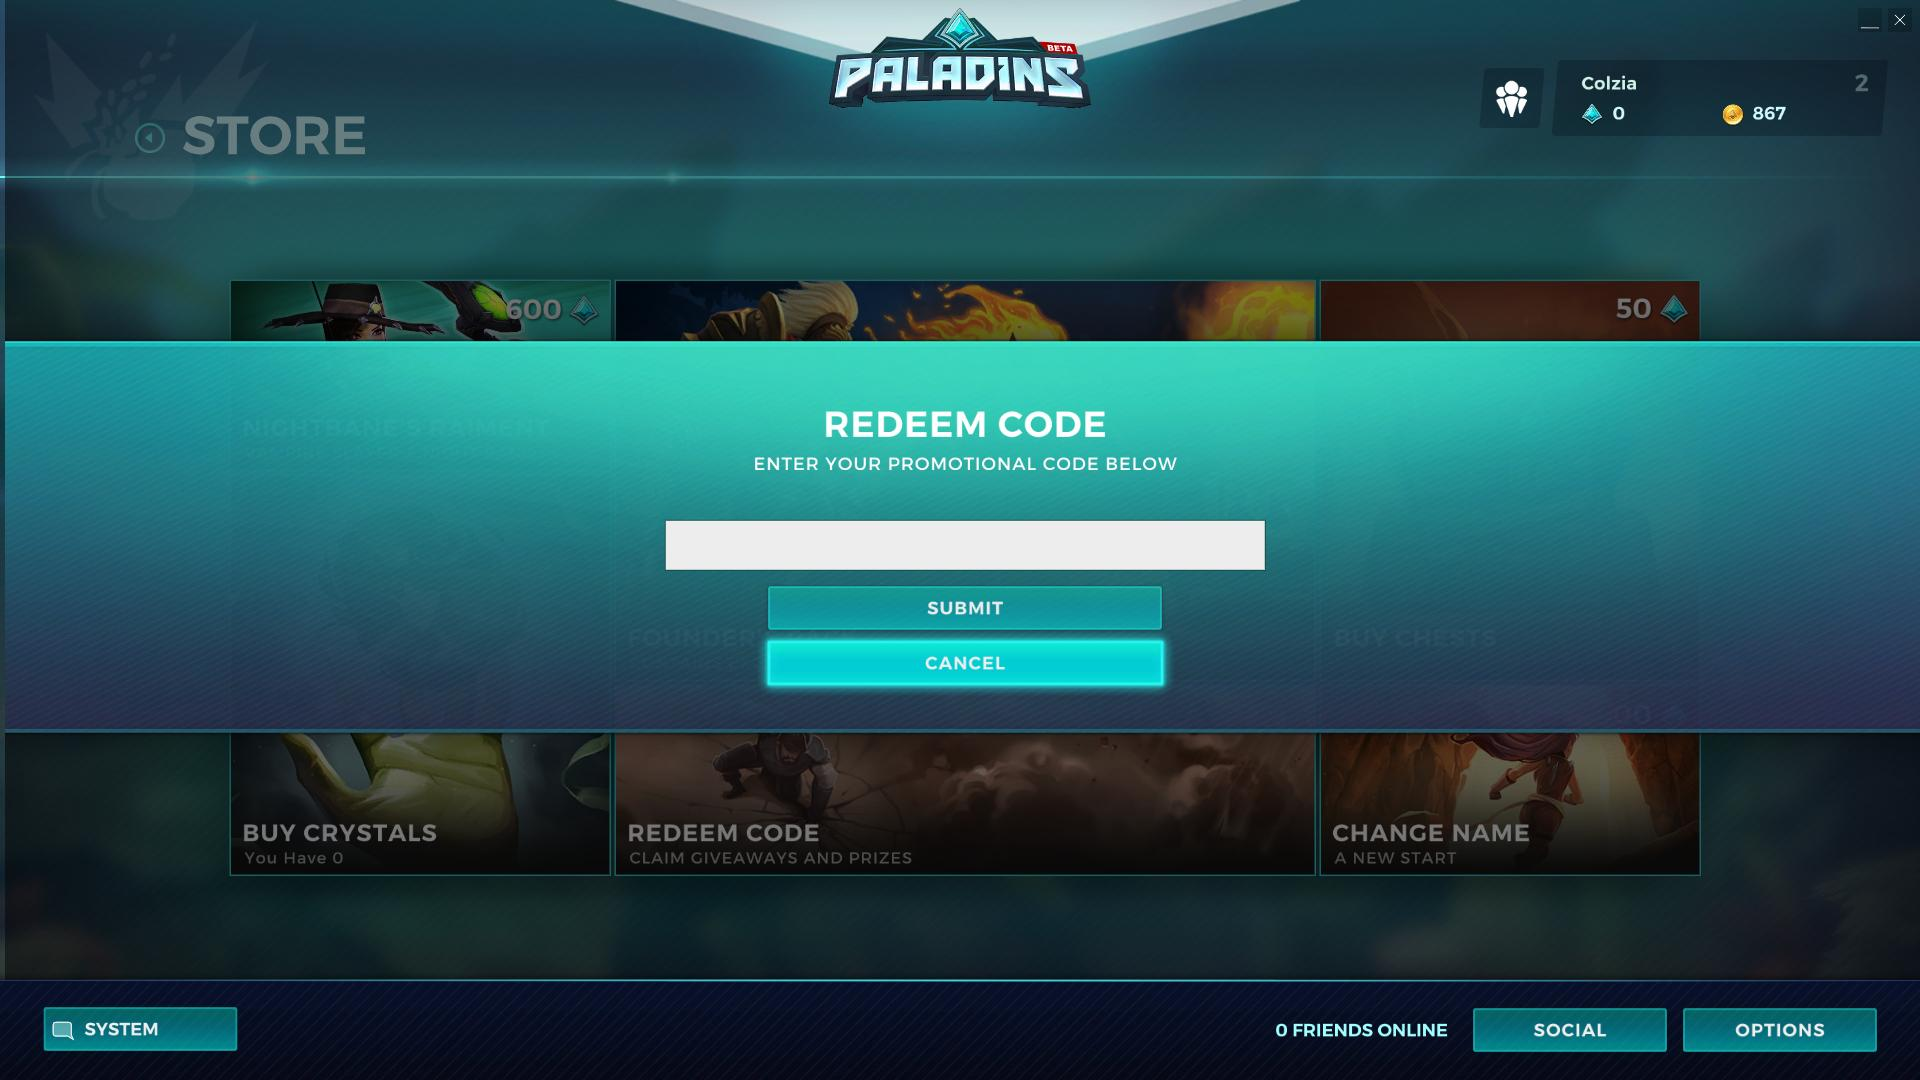 Redeem code paladins screenshot - Gamingcfg com